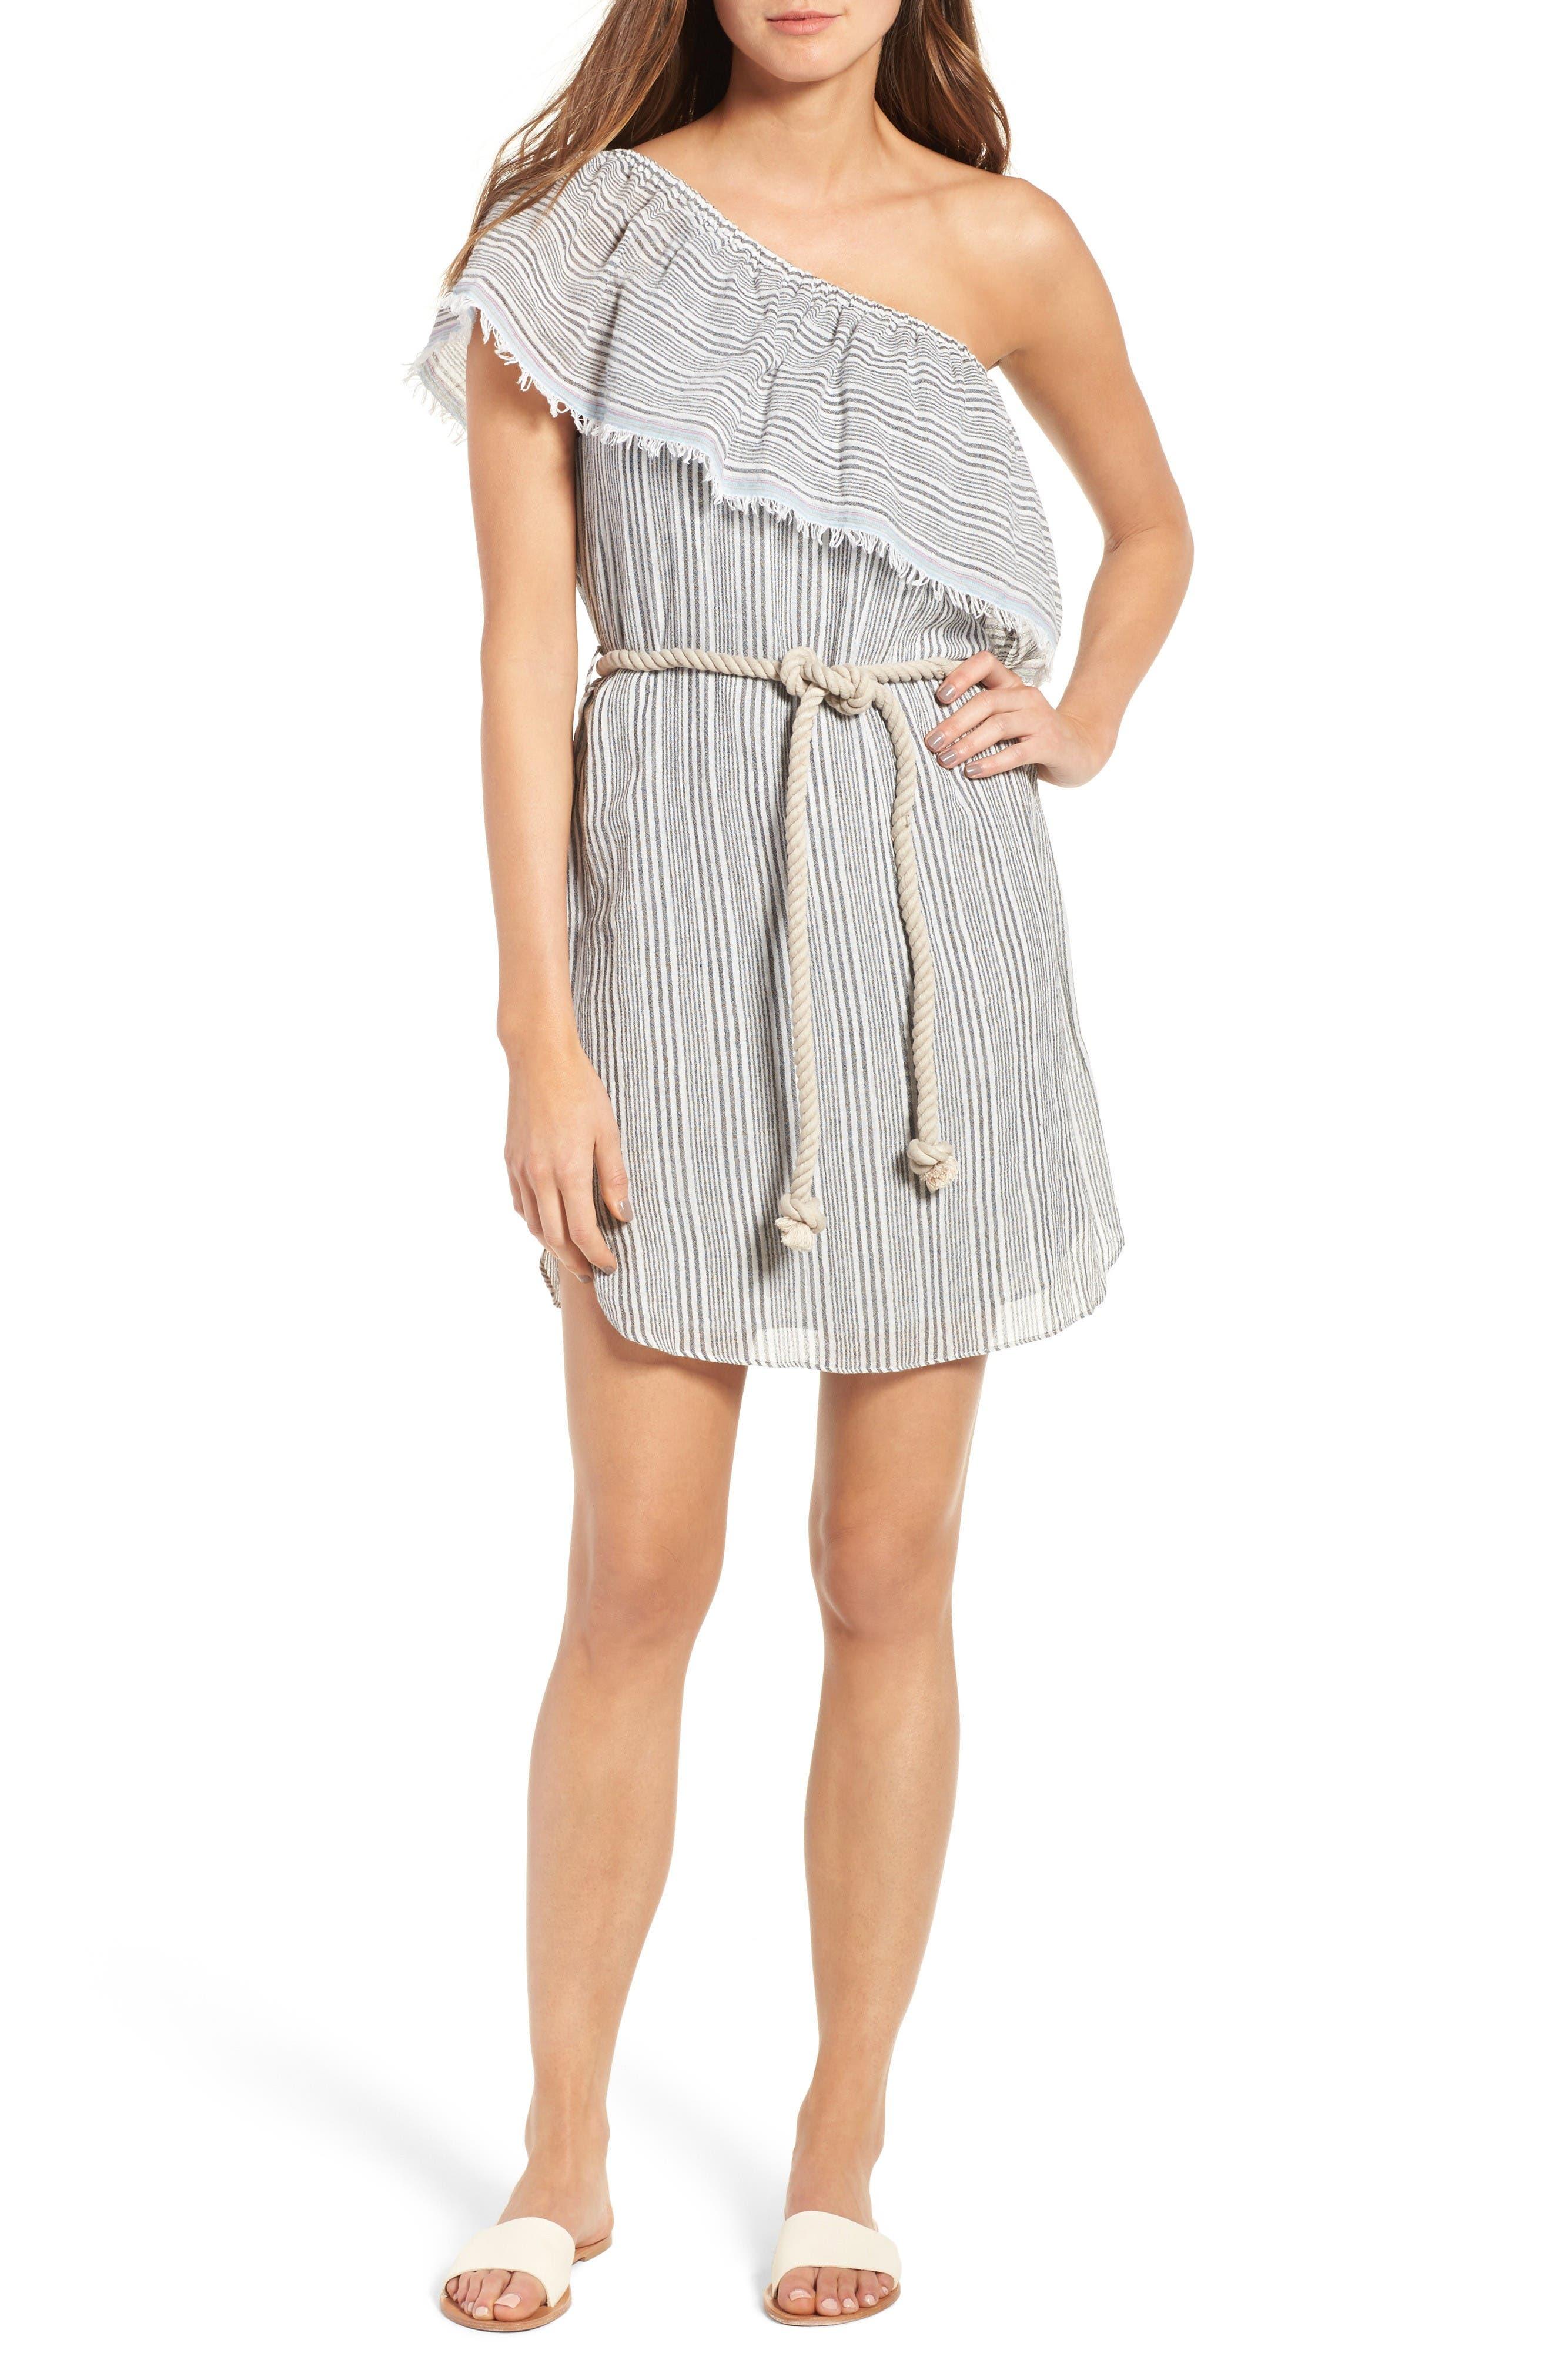 Bailey 44 Agadir Cotton One-Shoulder Dress